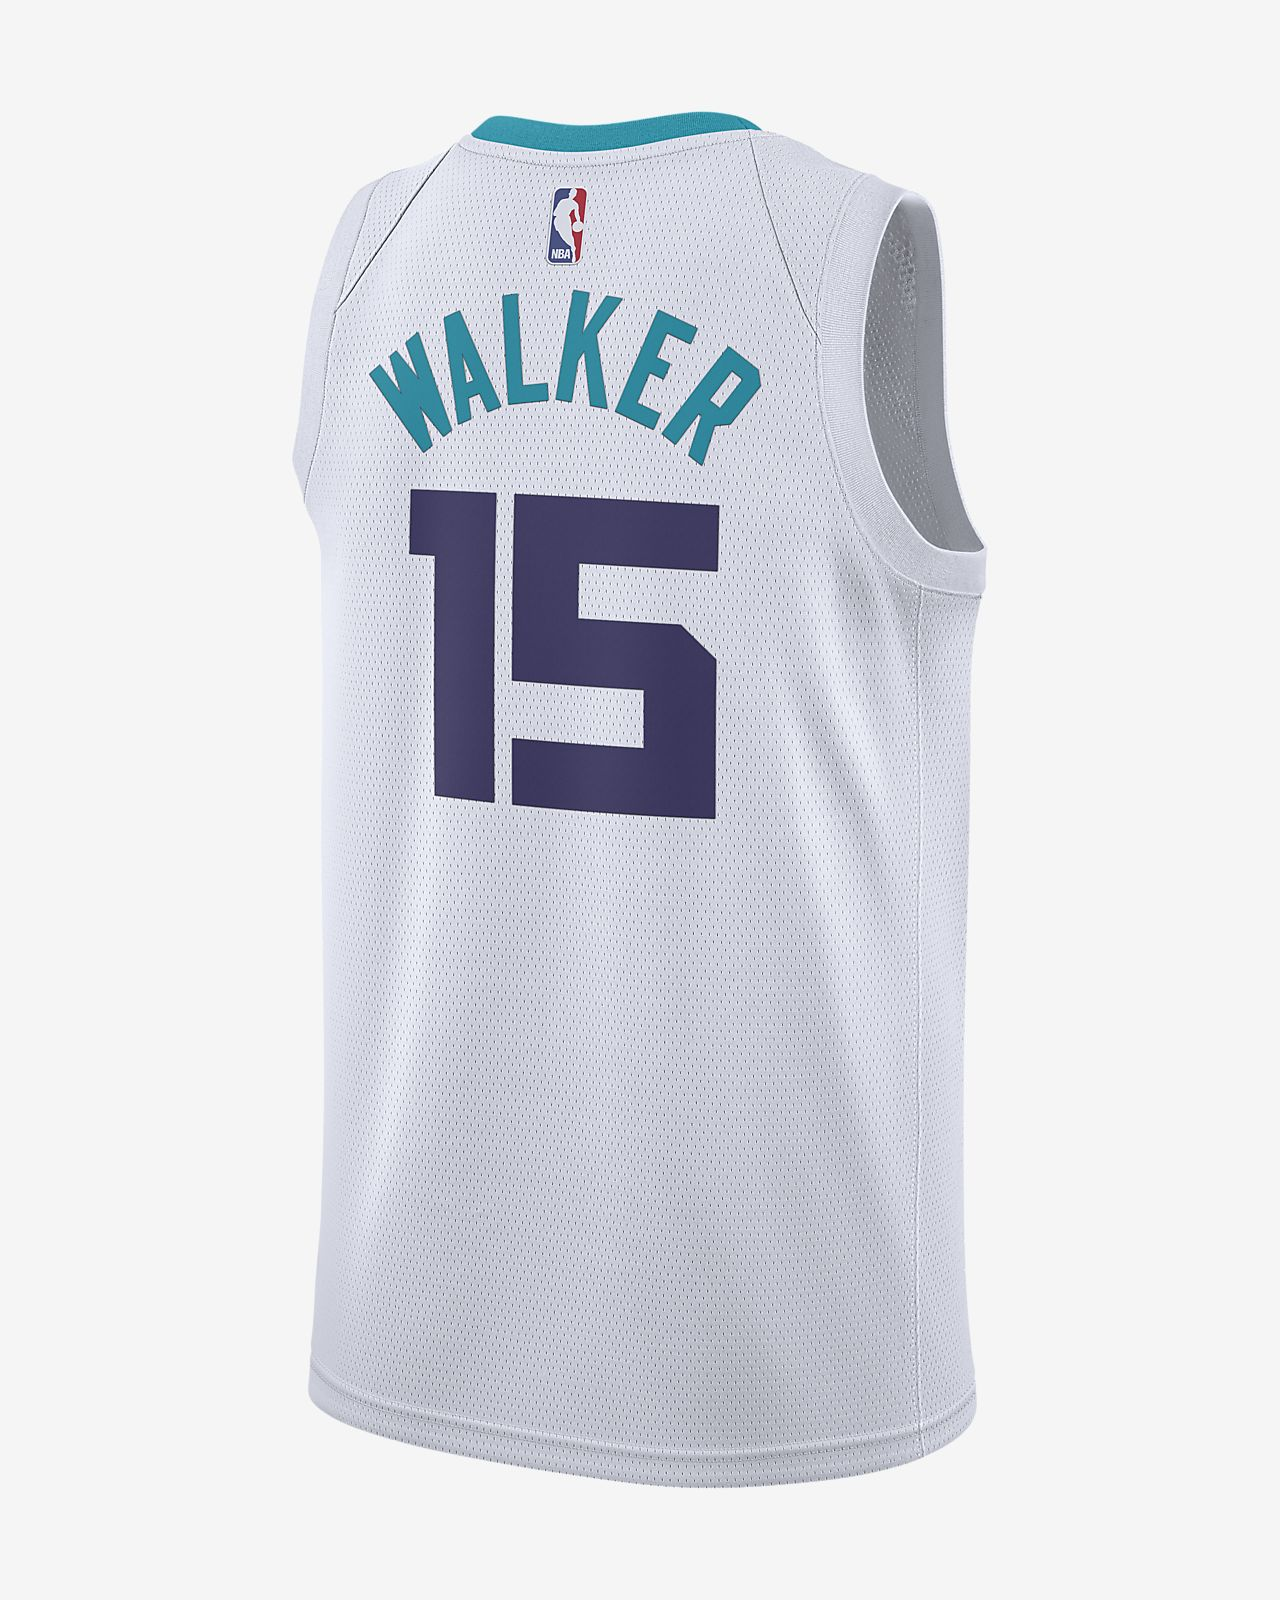 4544d4d902ed ... Kemba Walker Association Edition Swingman (Charlotte Hornets) Men s  Jordan NBA Connected Jersey